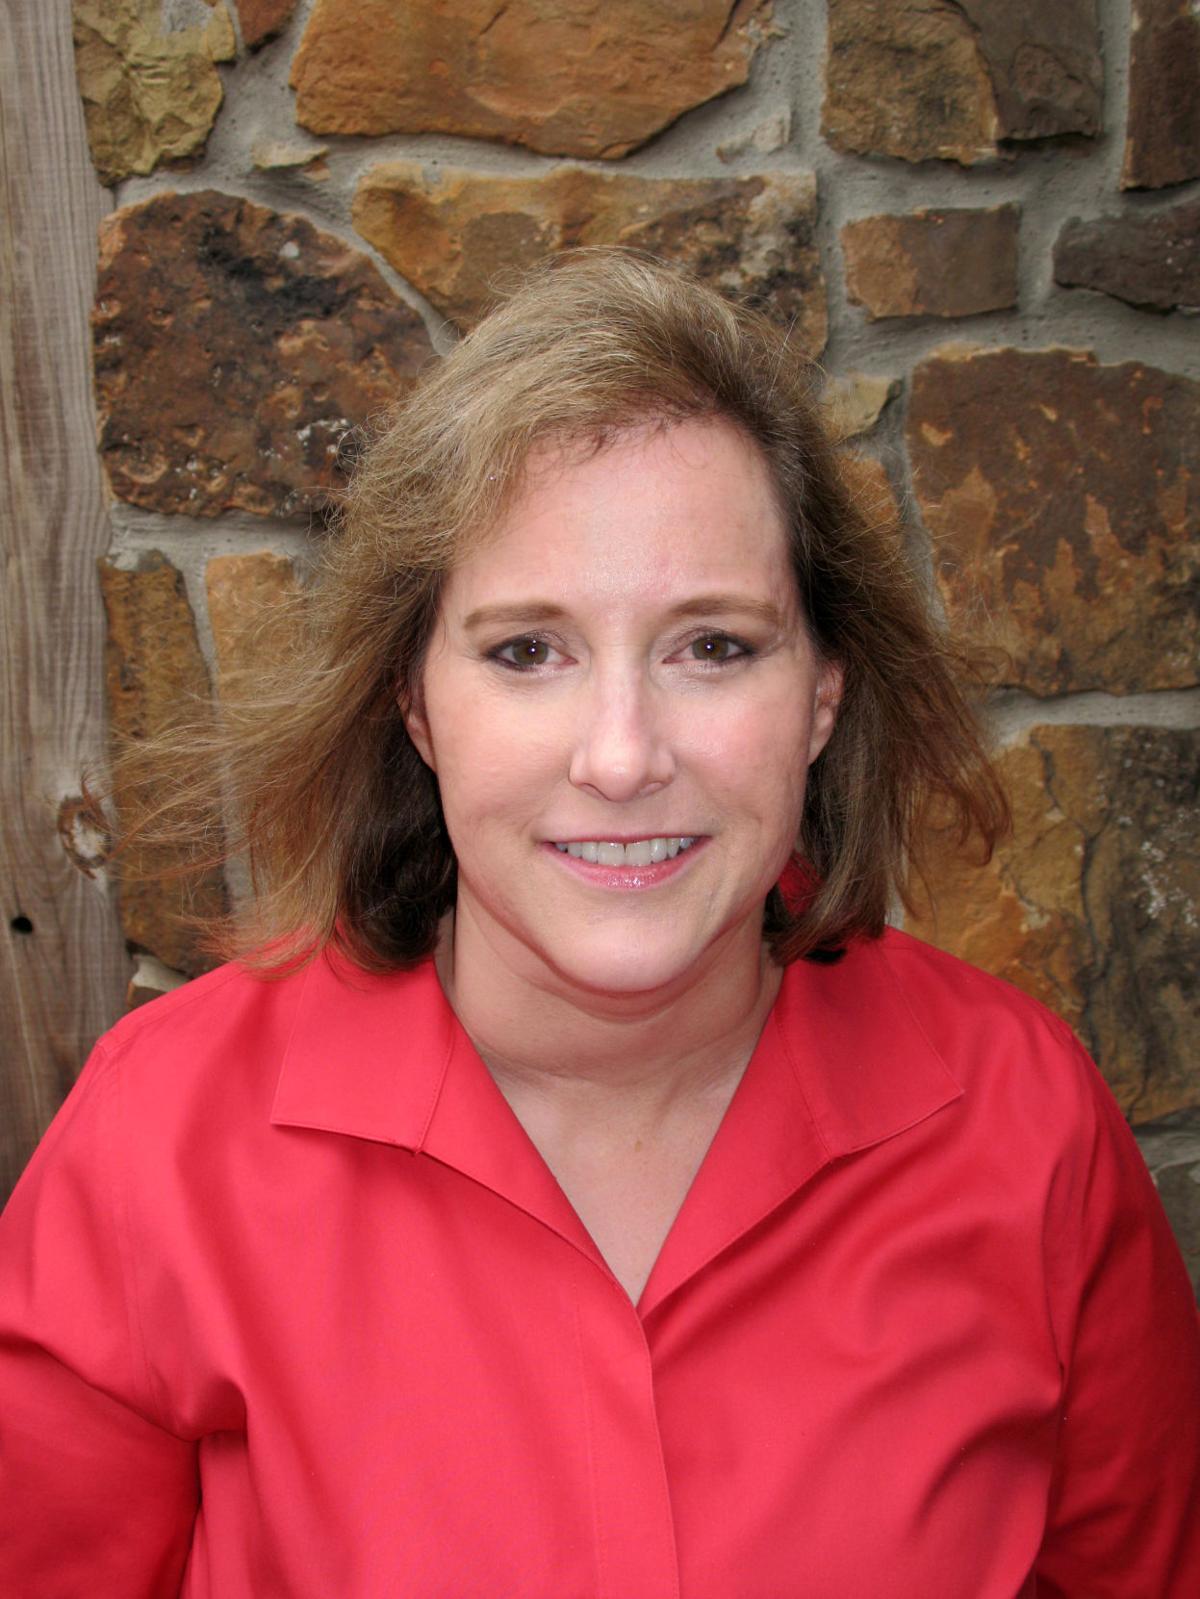 Keri Samford